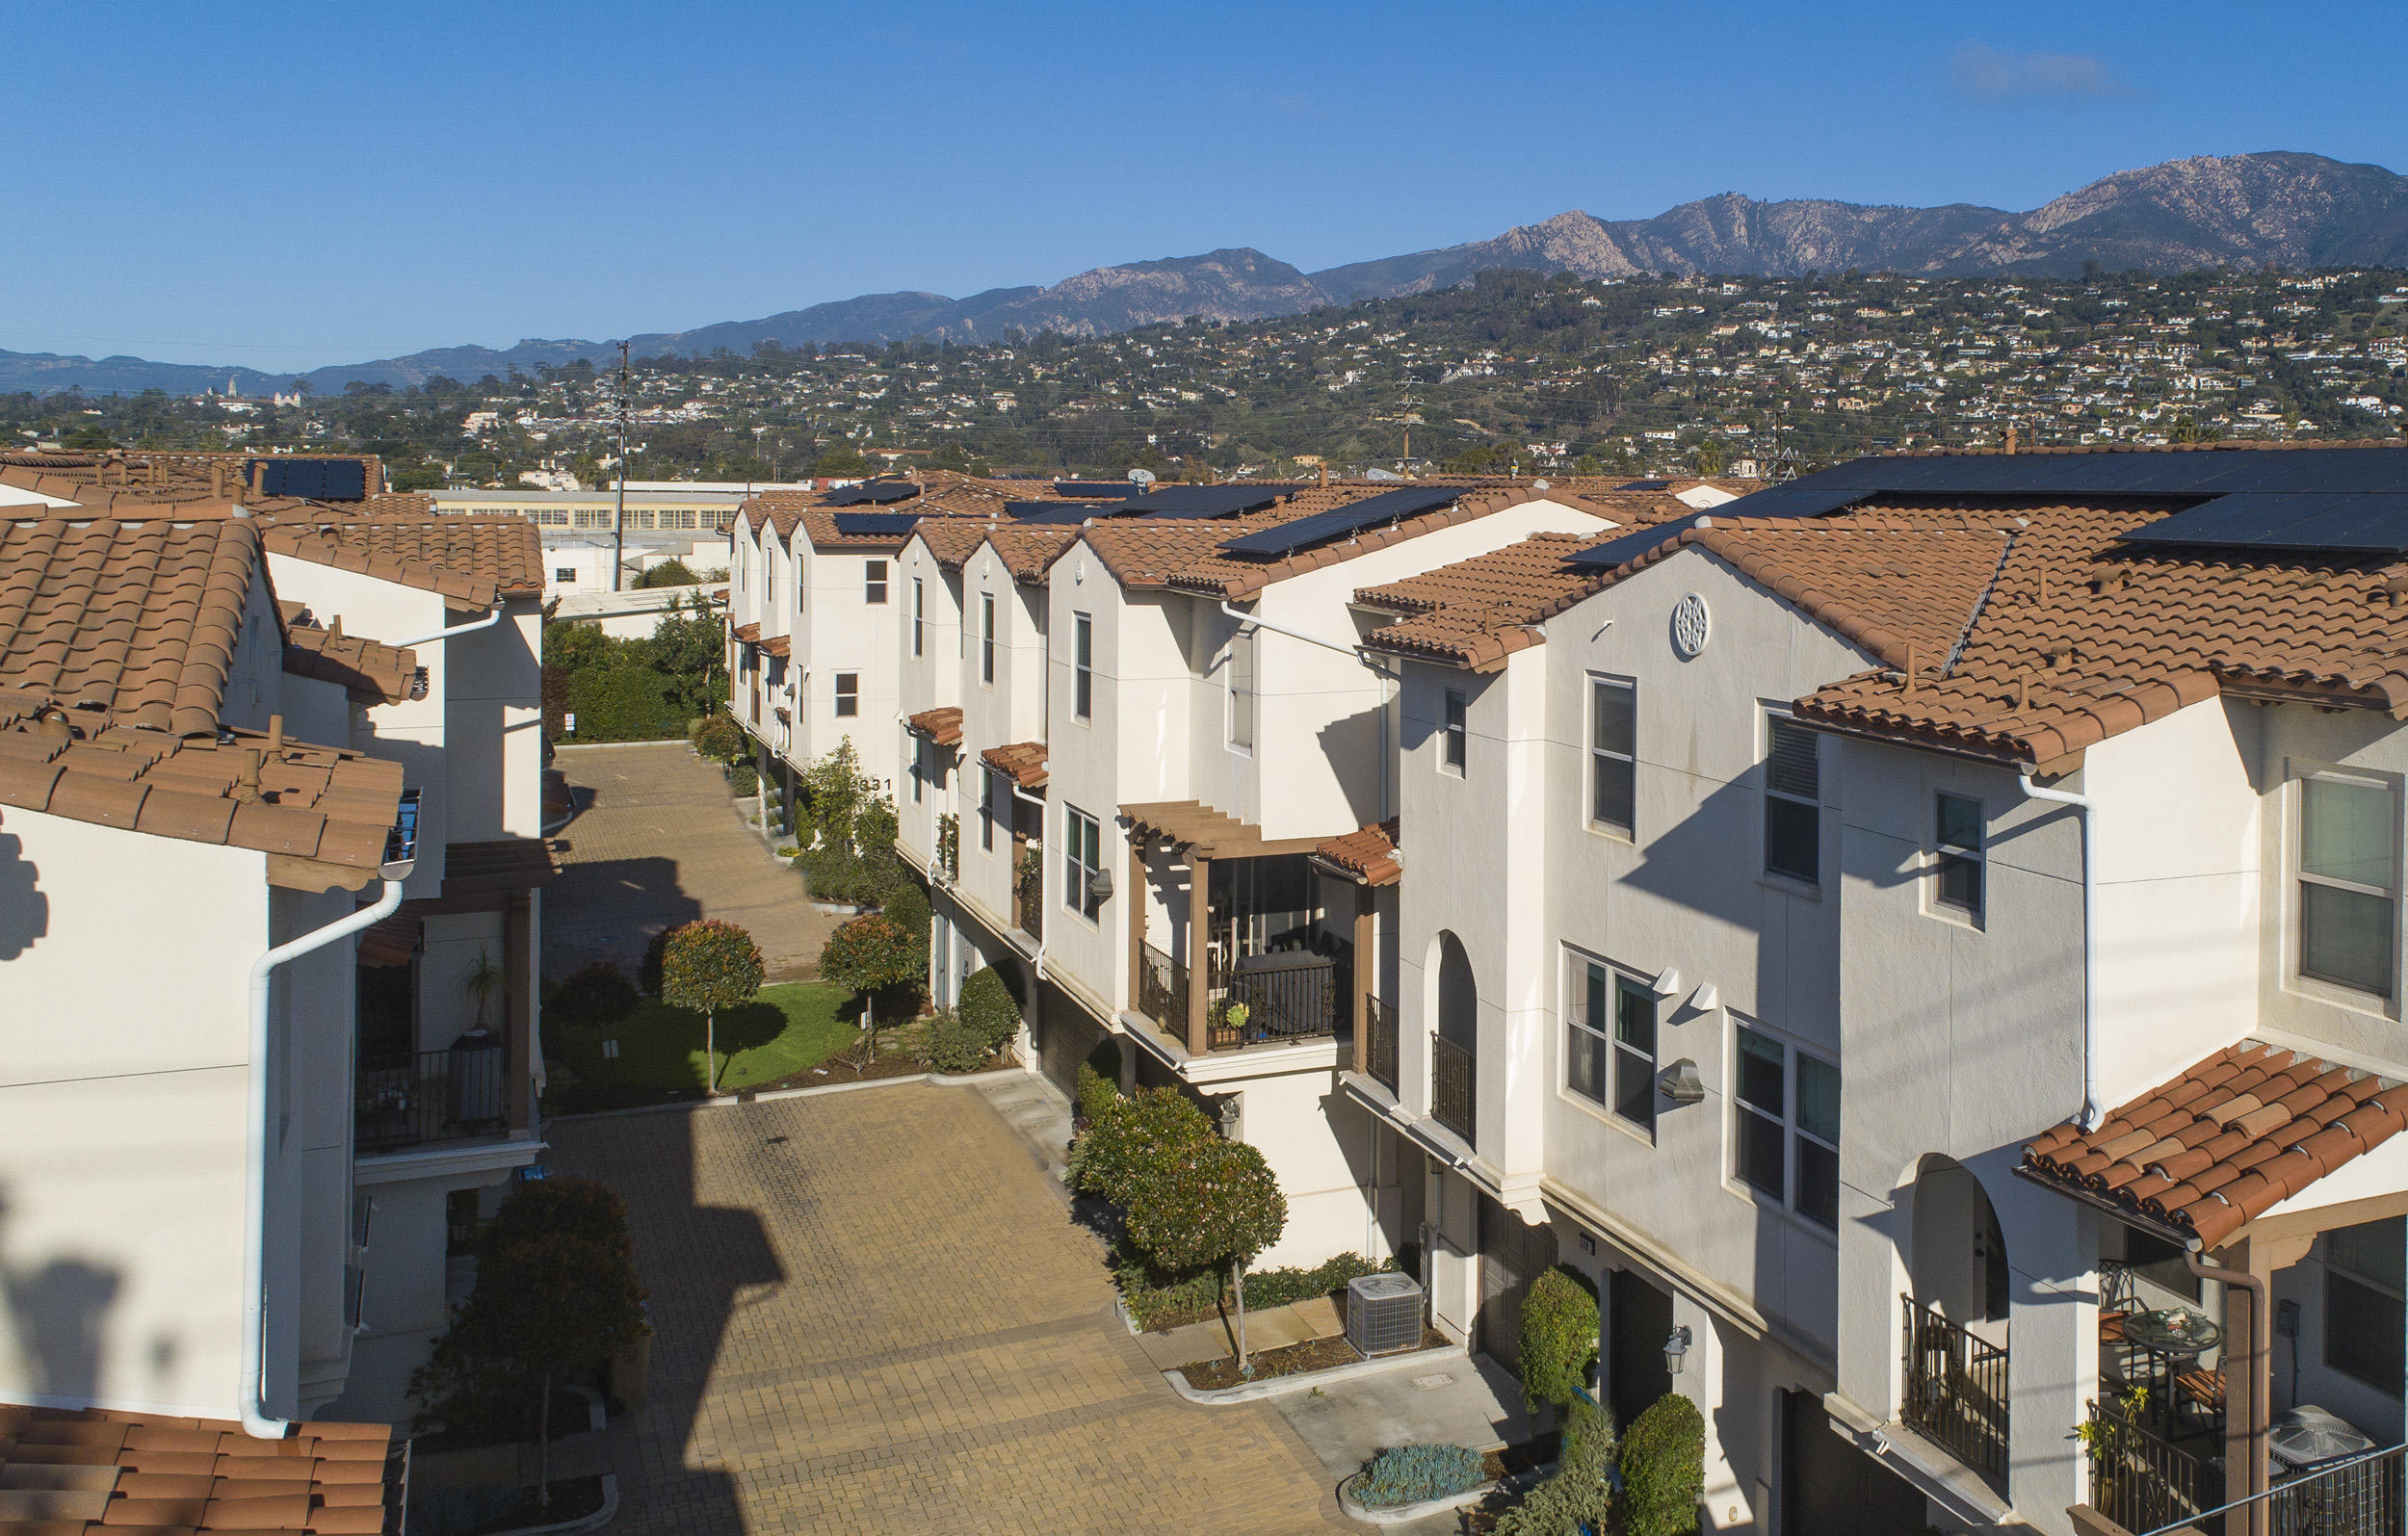 541 E Montecito St, Santa Barbara, California